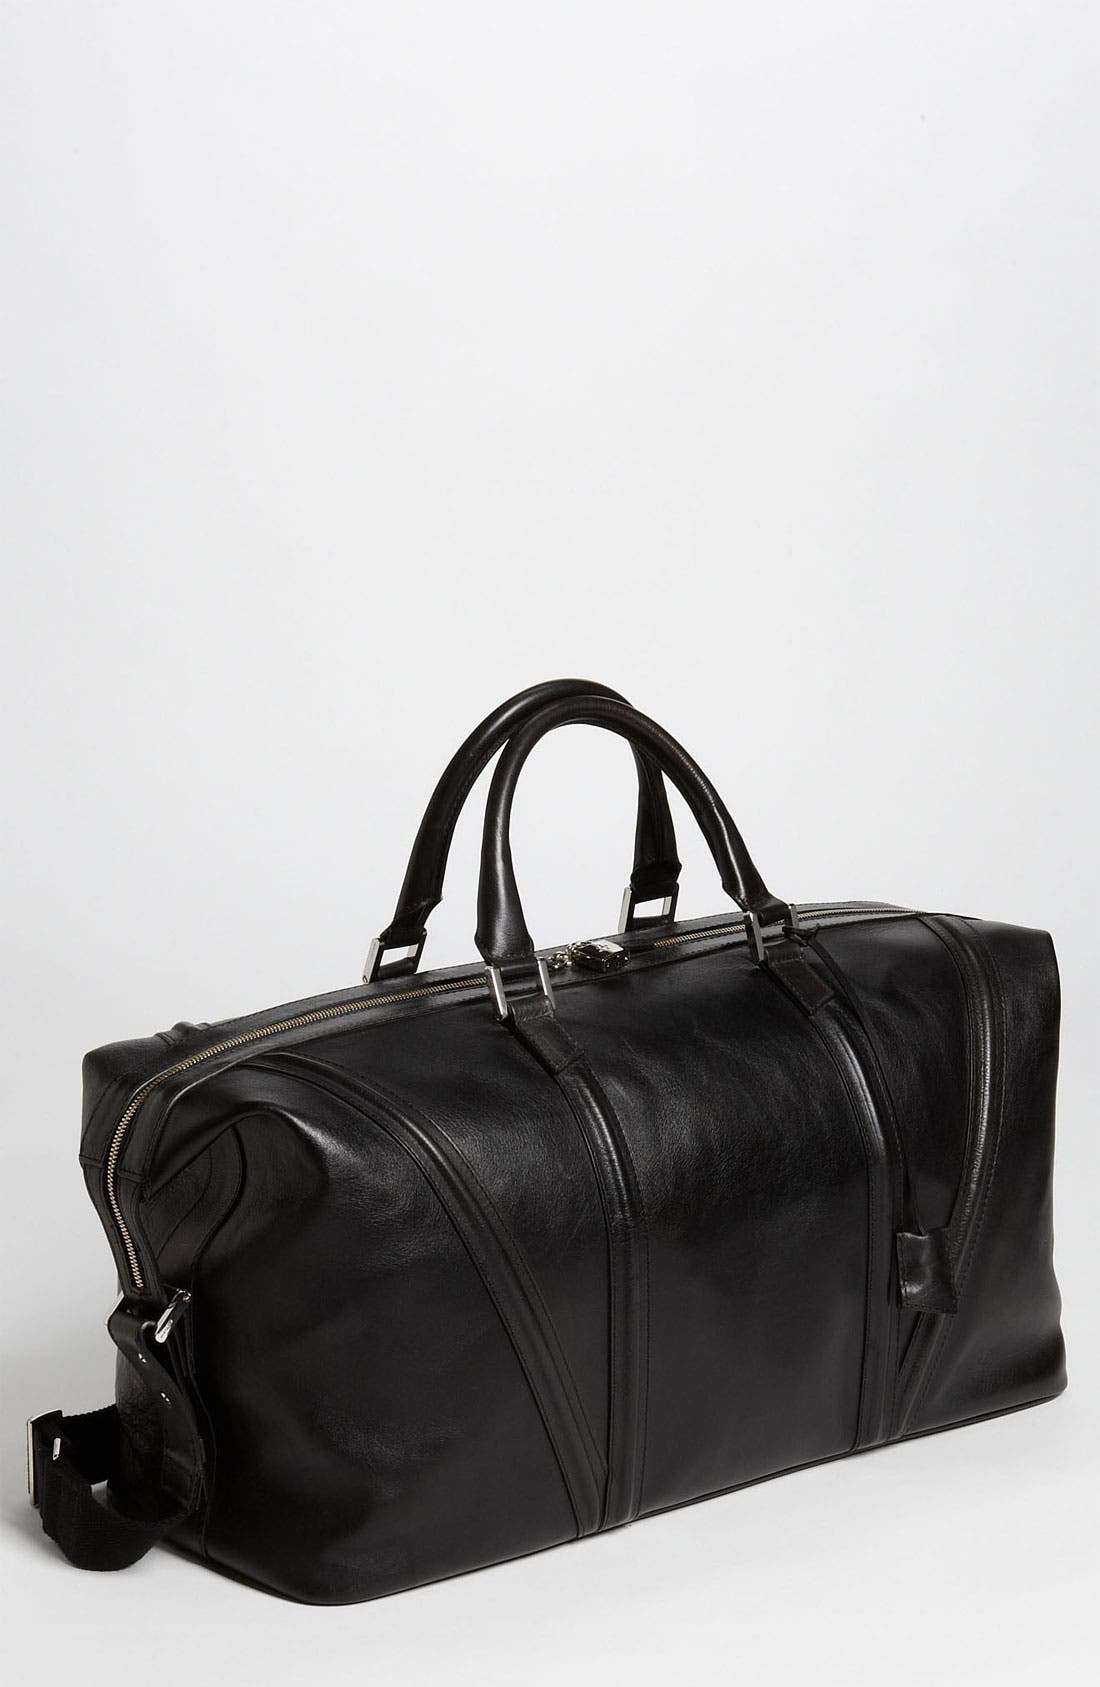 Alternate Image 1 Selected - WANT Les Essentiels De La Vie 'Deurne' Leather Duffel Bag